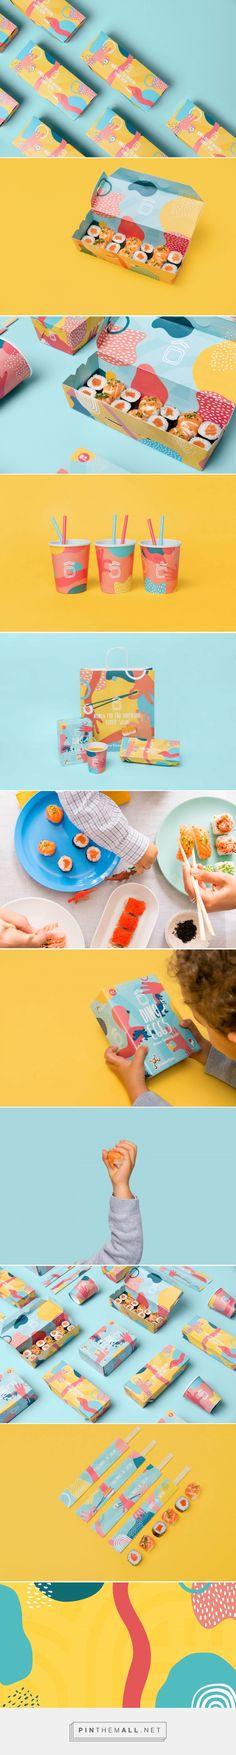 Home Sweet Sushi Kids packaging design by Savvy Agency - https://www.packagingoftheworld.com/2018/06/home-sweet-sushi-kids.html